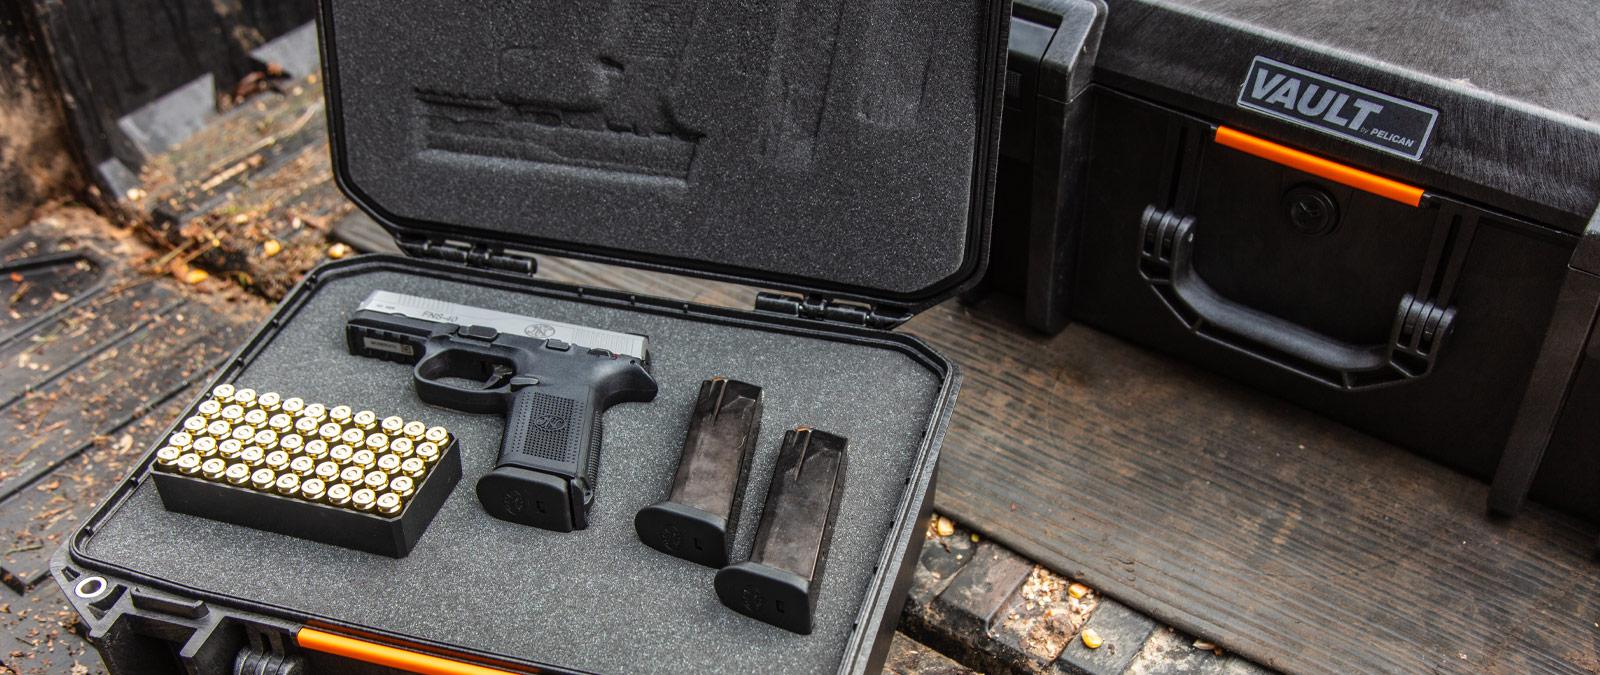 handgun shipment safety